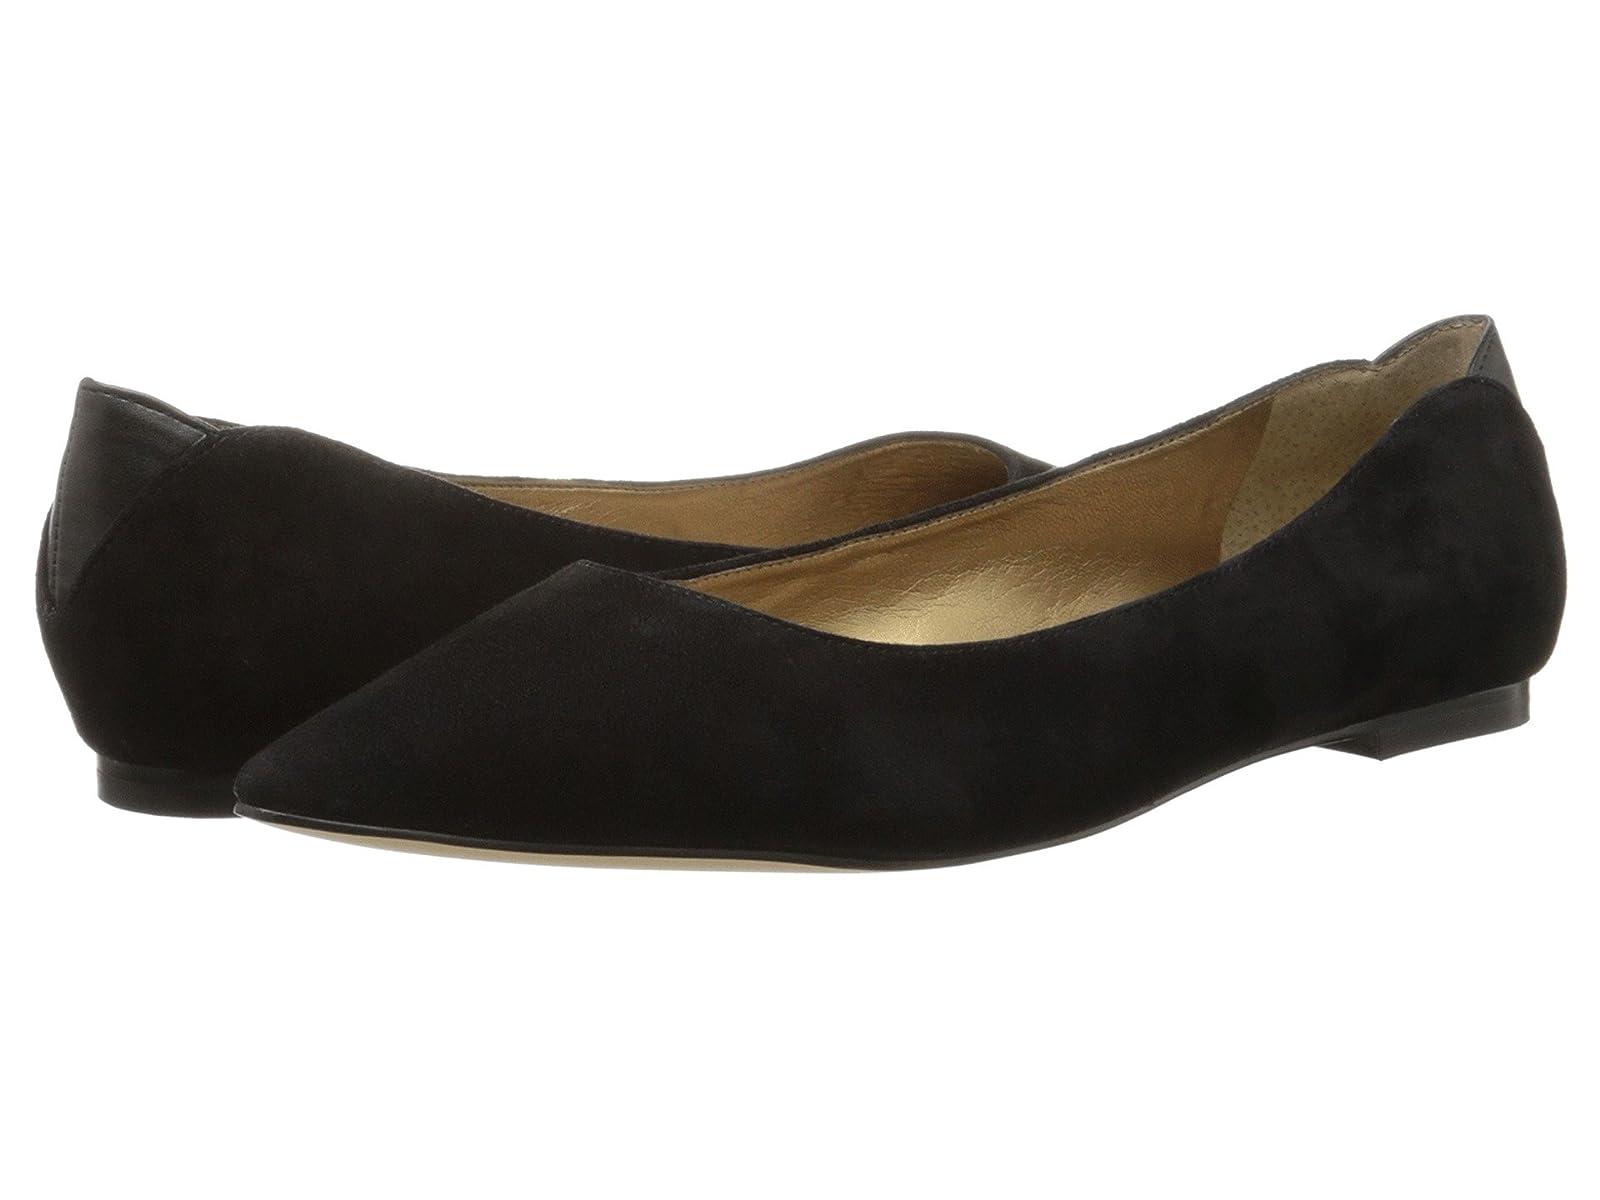 Sam Edelman RaeCheap and distinctive eye-catching shoes